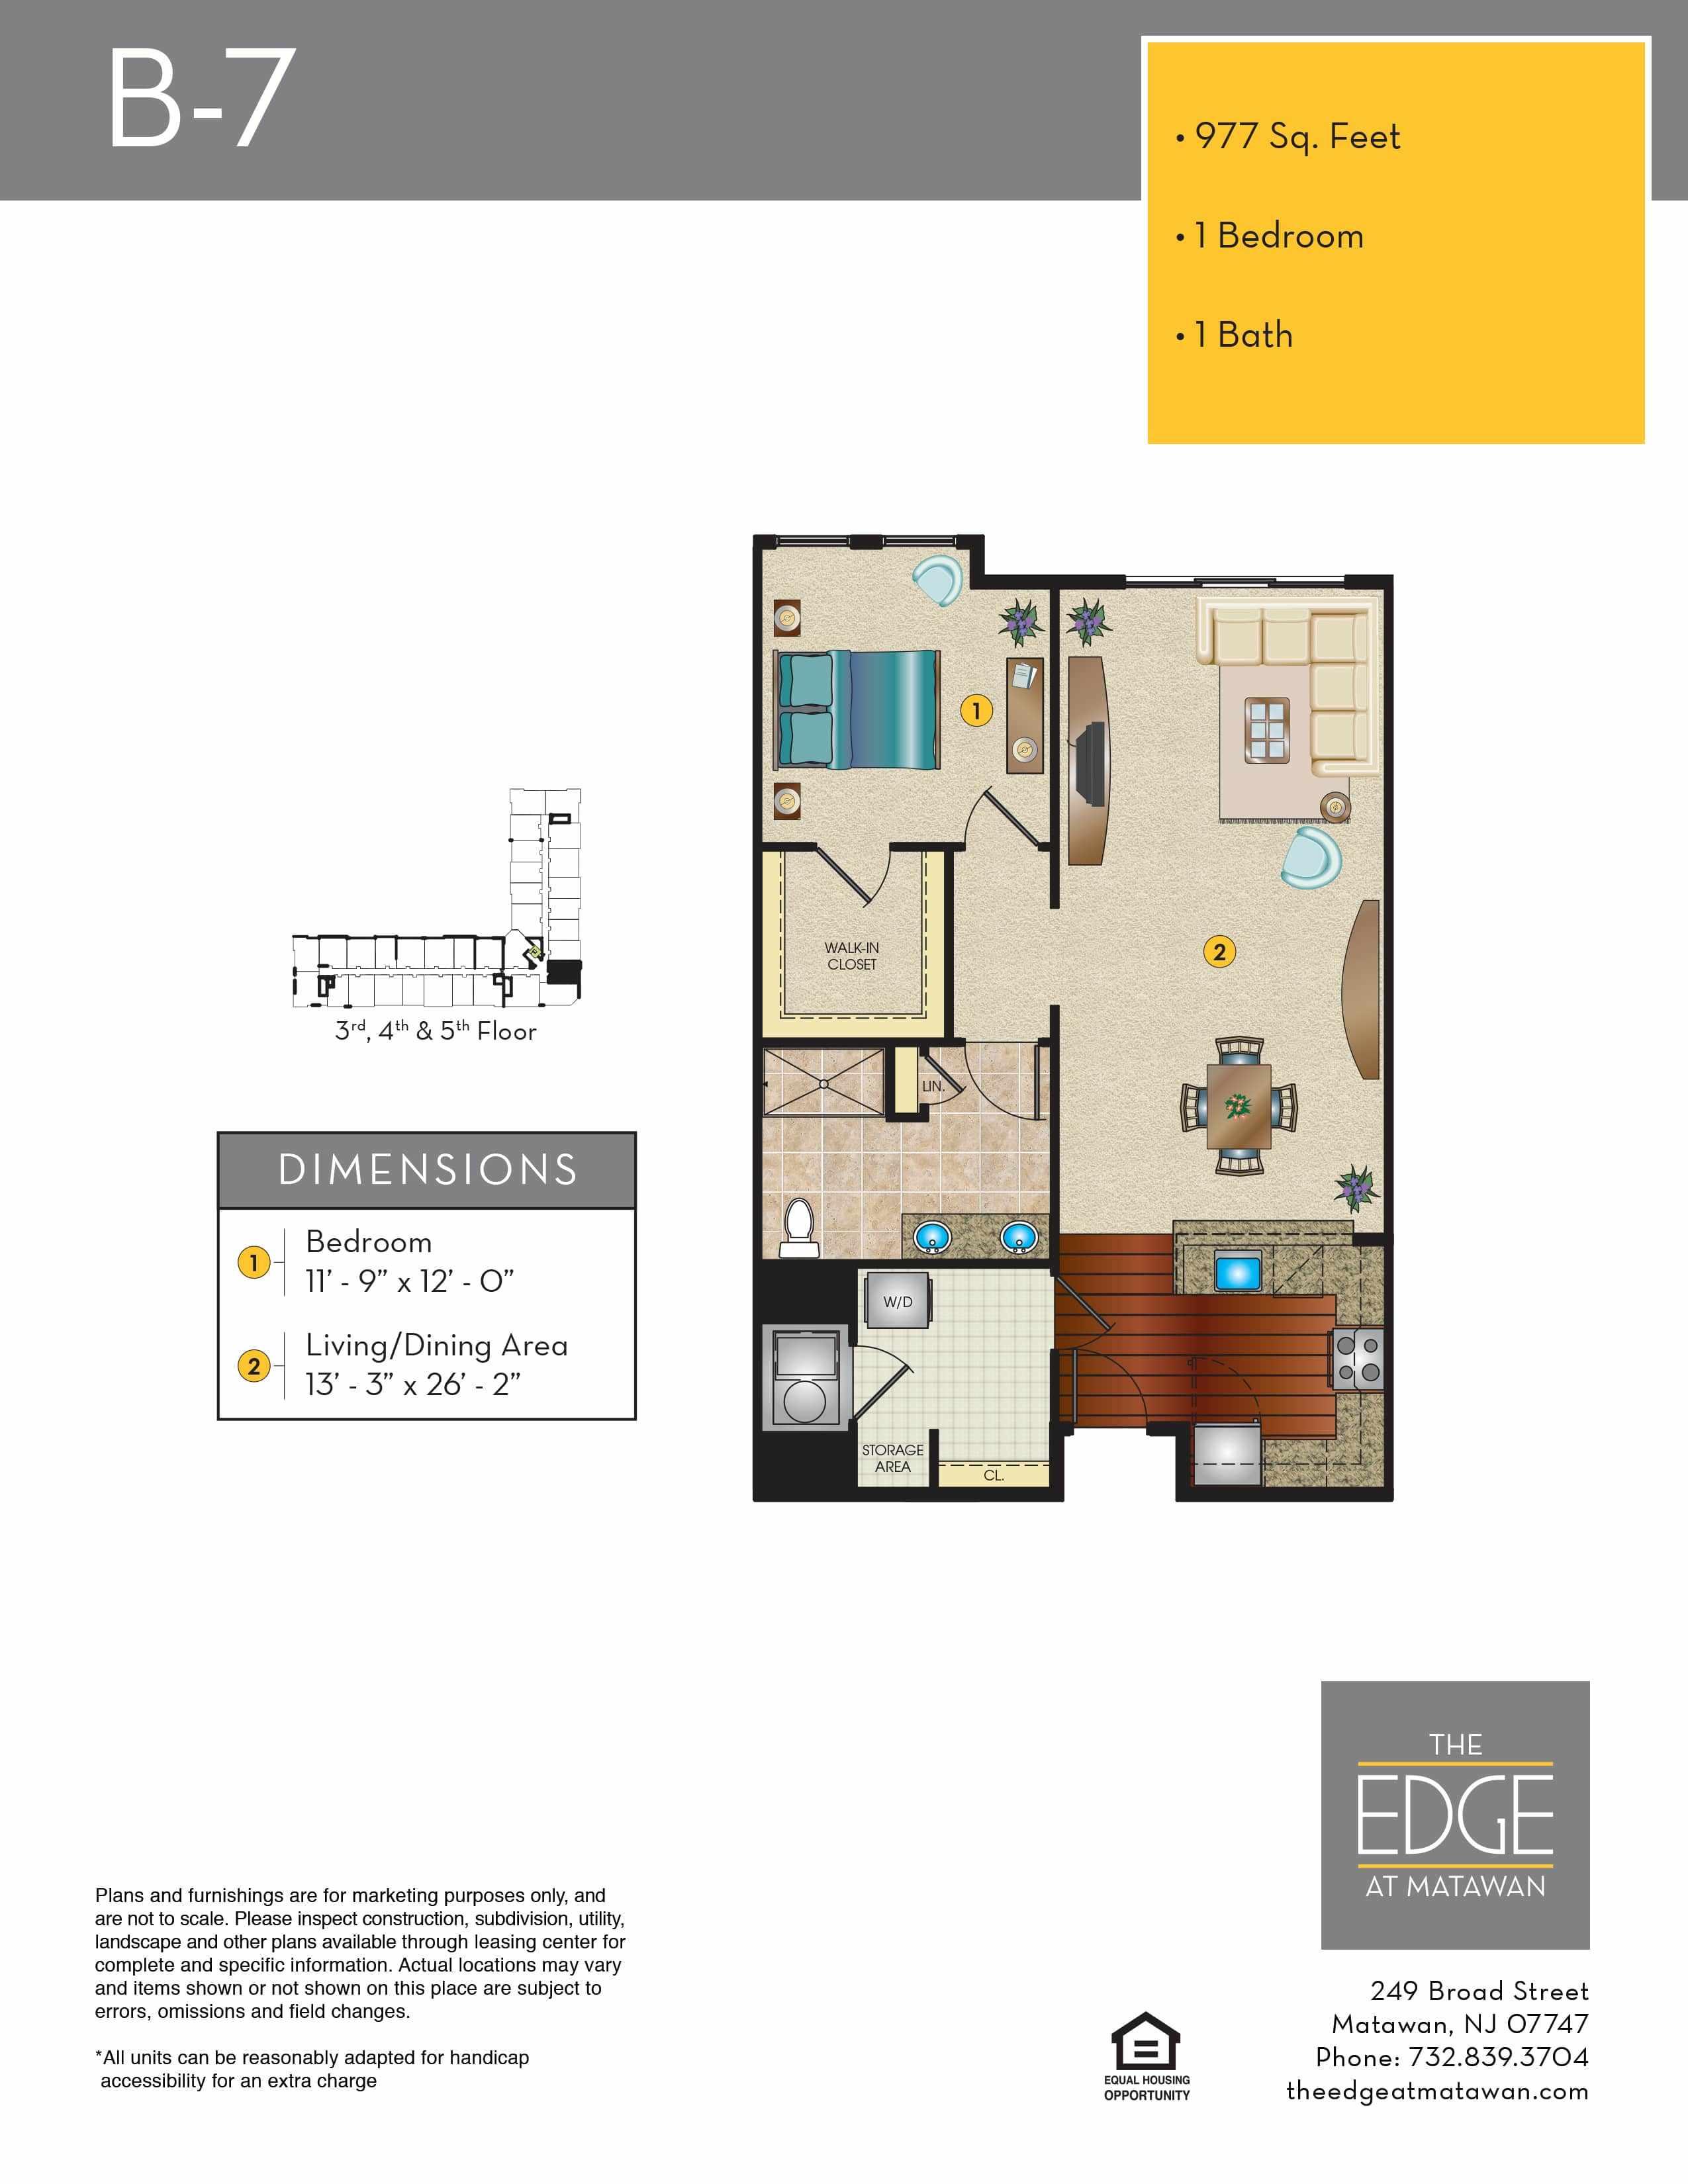 B7 Floor Plan